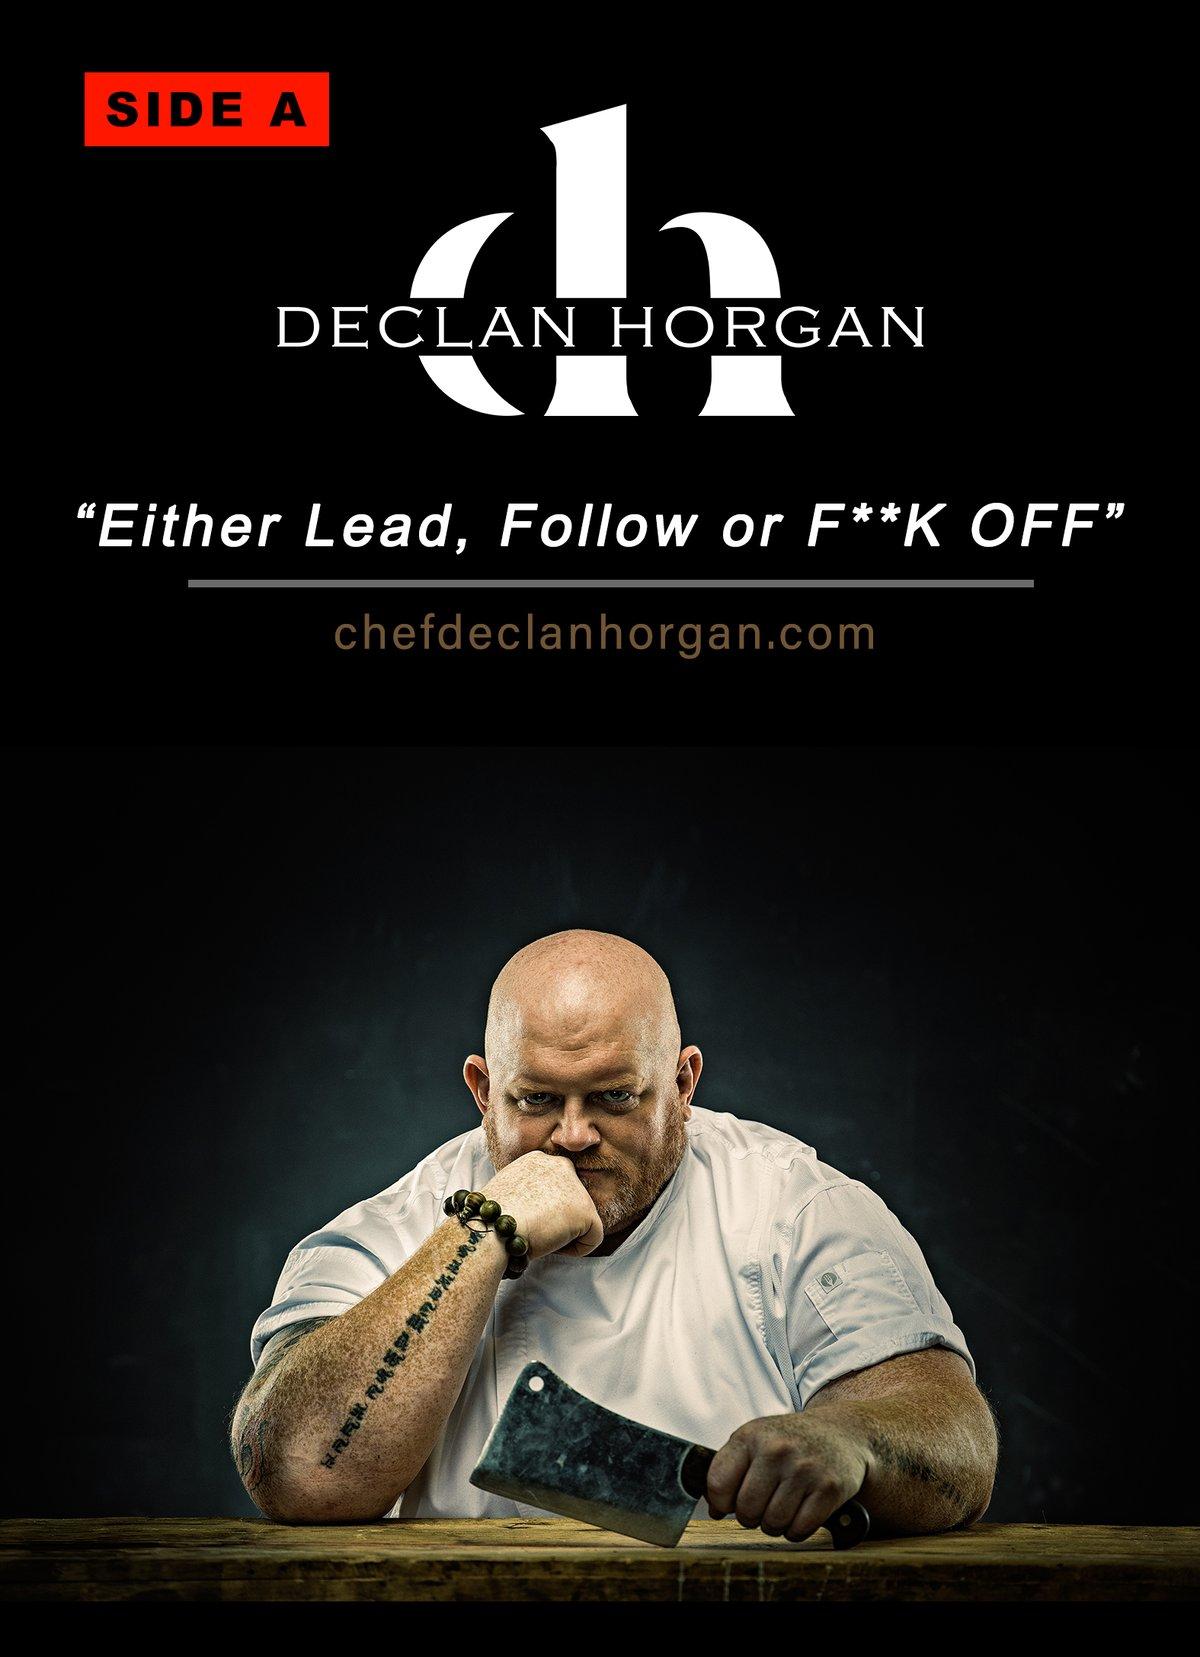 Image of Chef Declan: Autograph Postcard